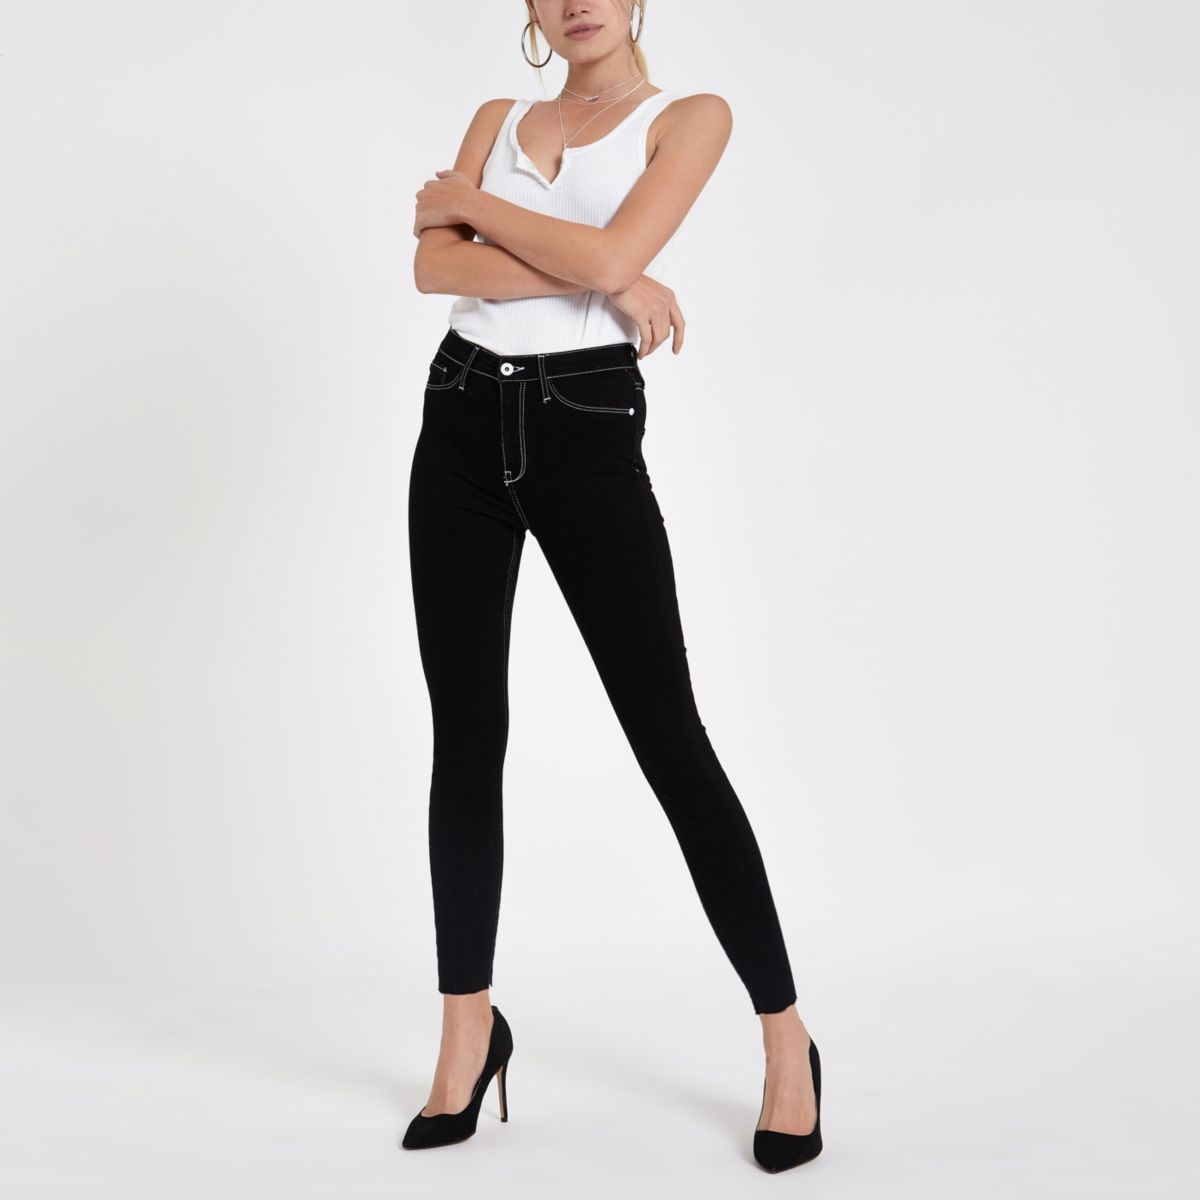 Harper - Zwarte jeans met hoge taille en contrast